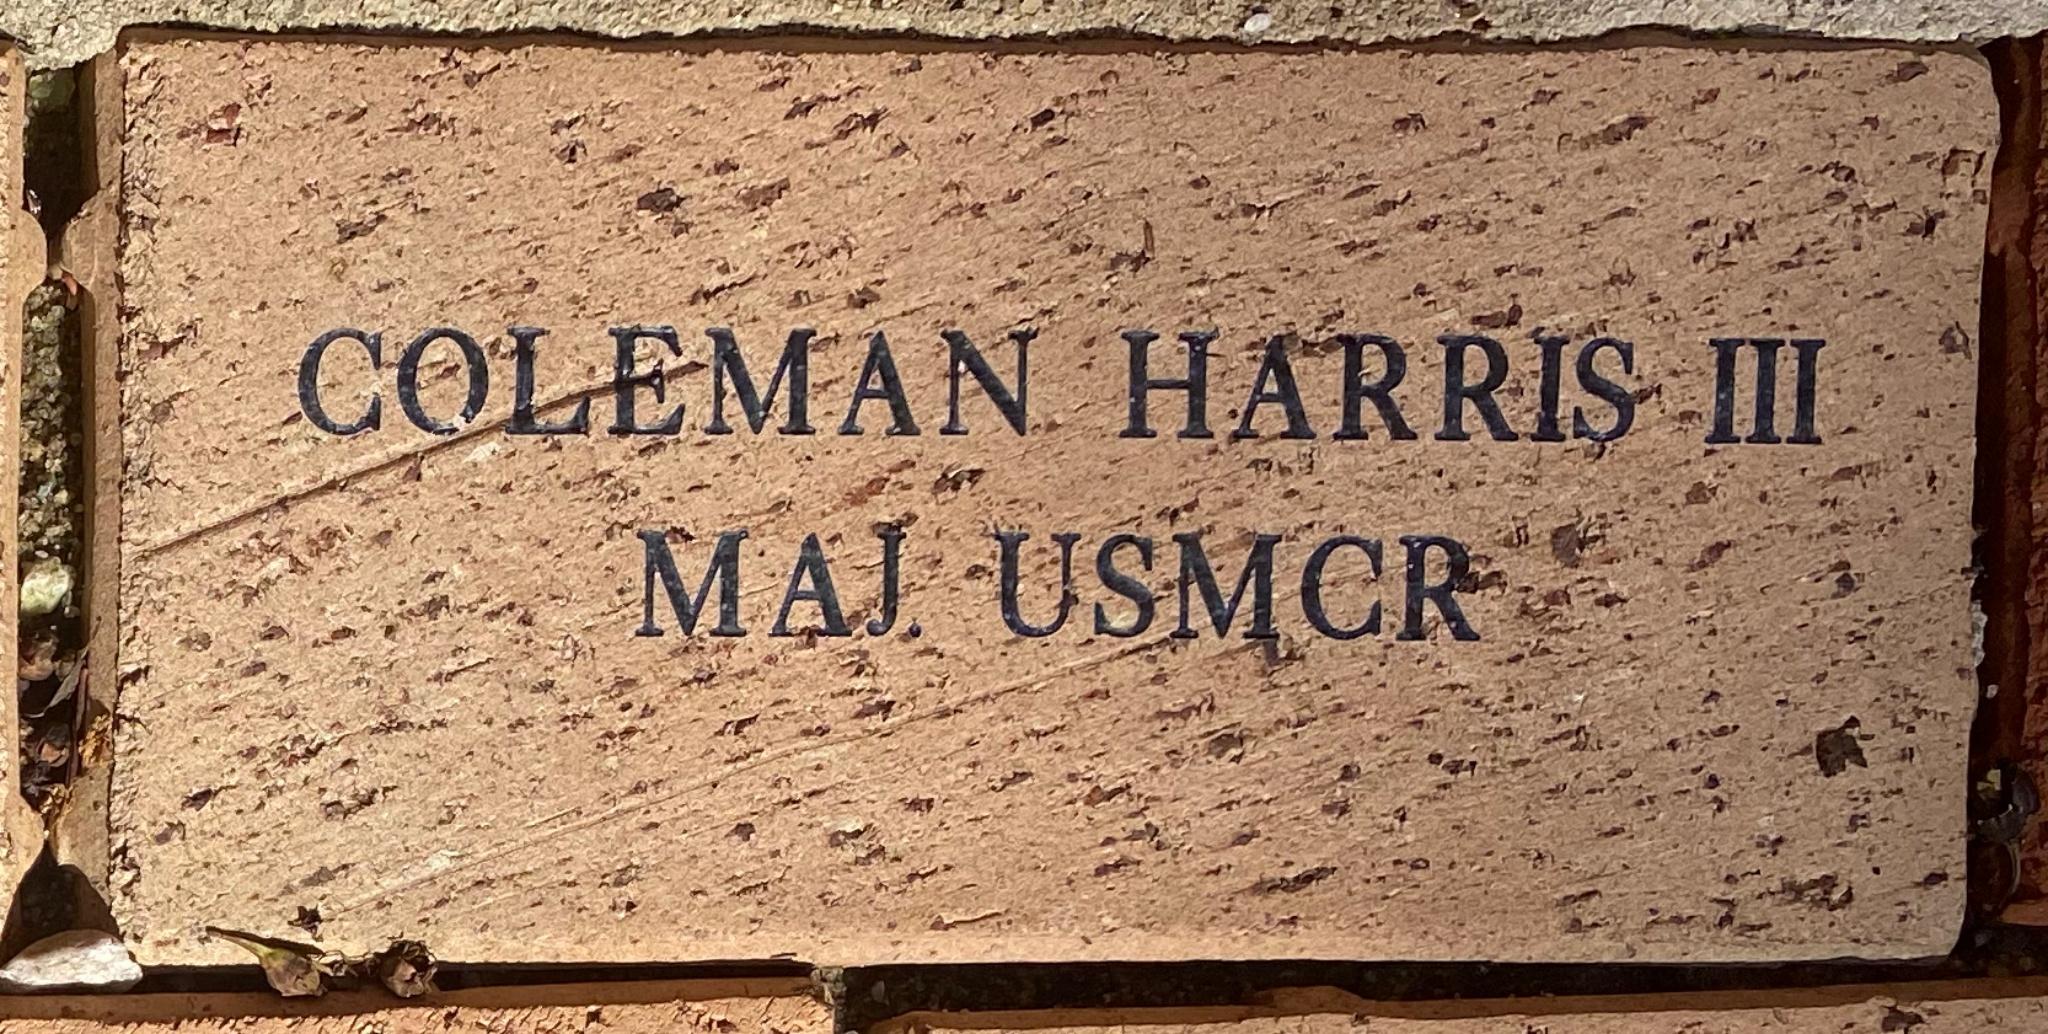 COLEMAN HARRIS III MAJ. USMCR